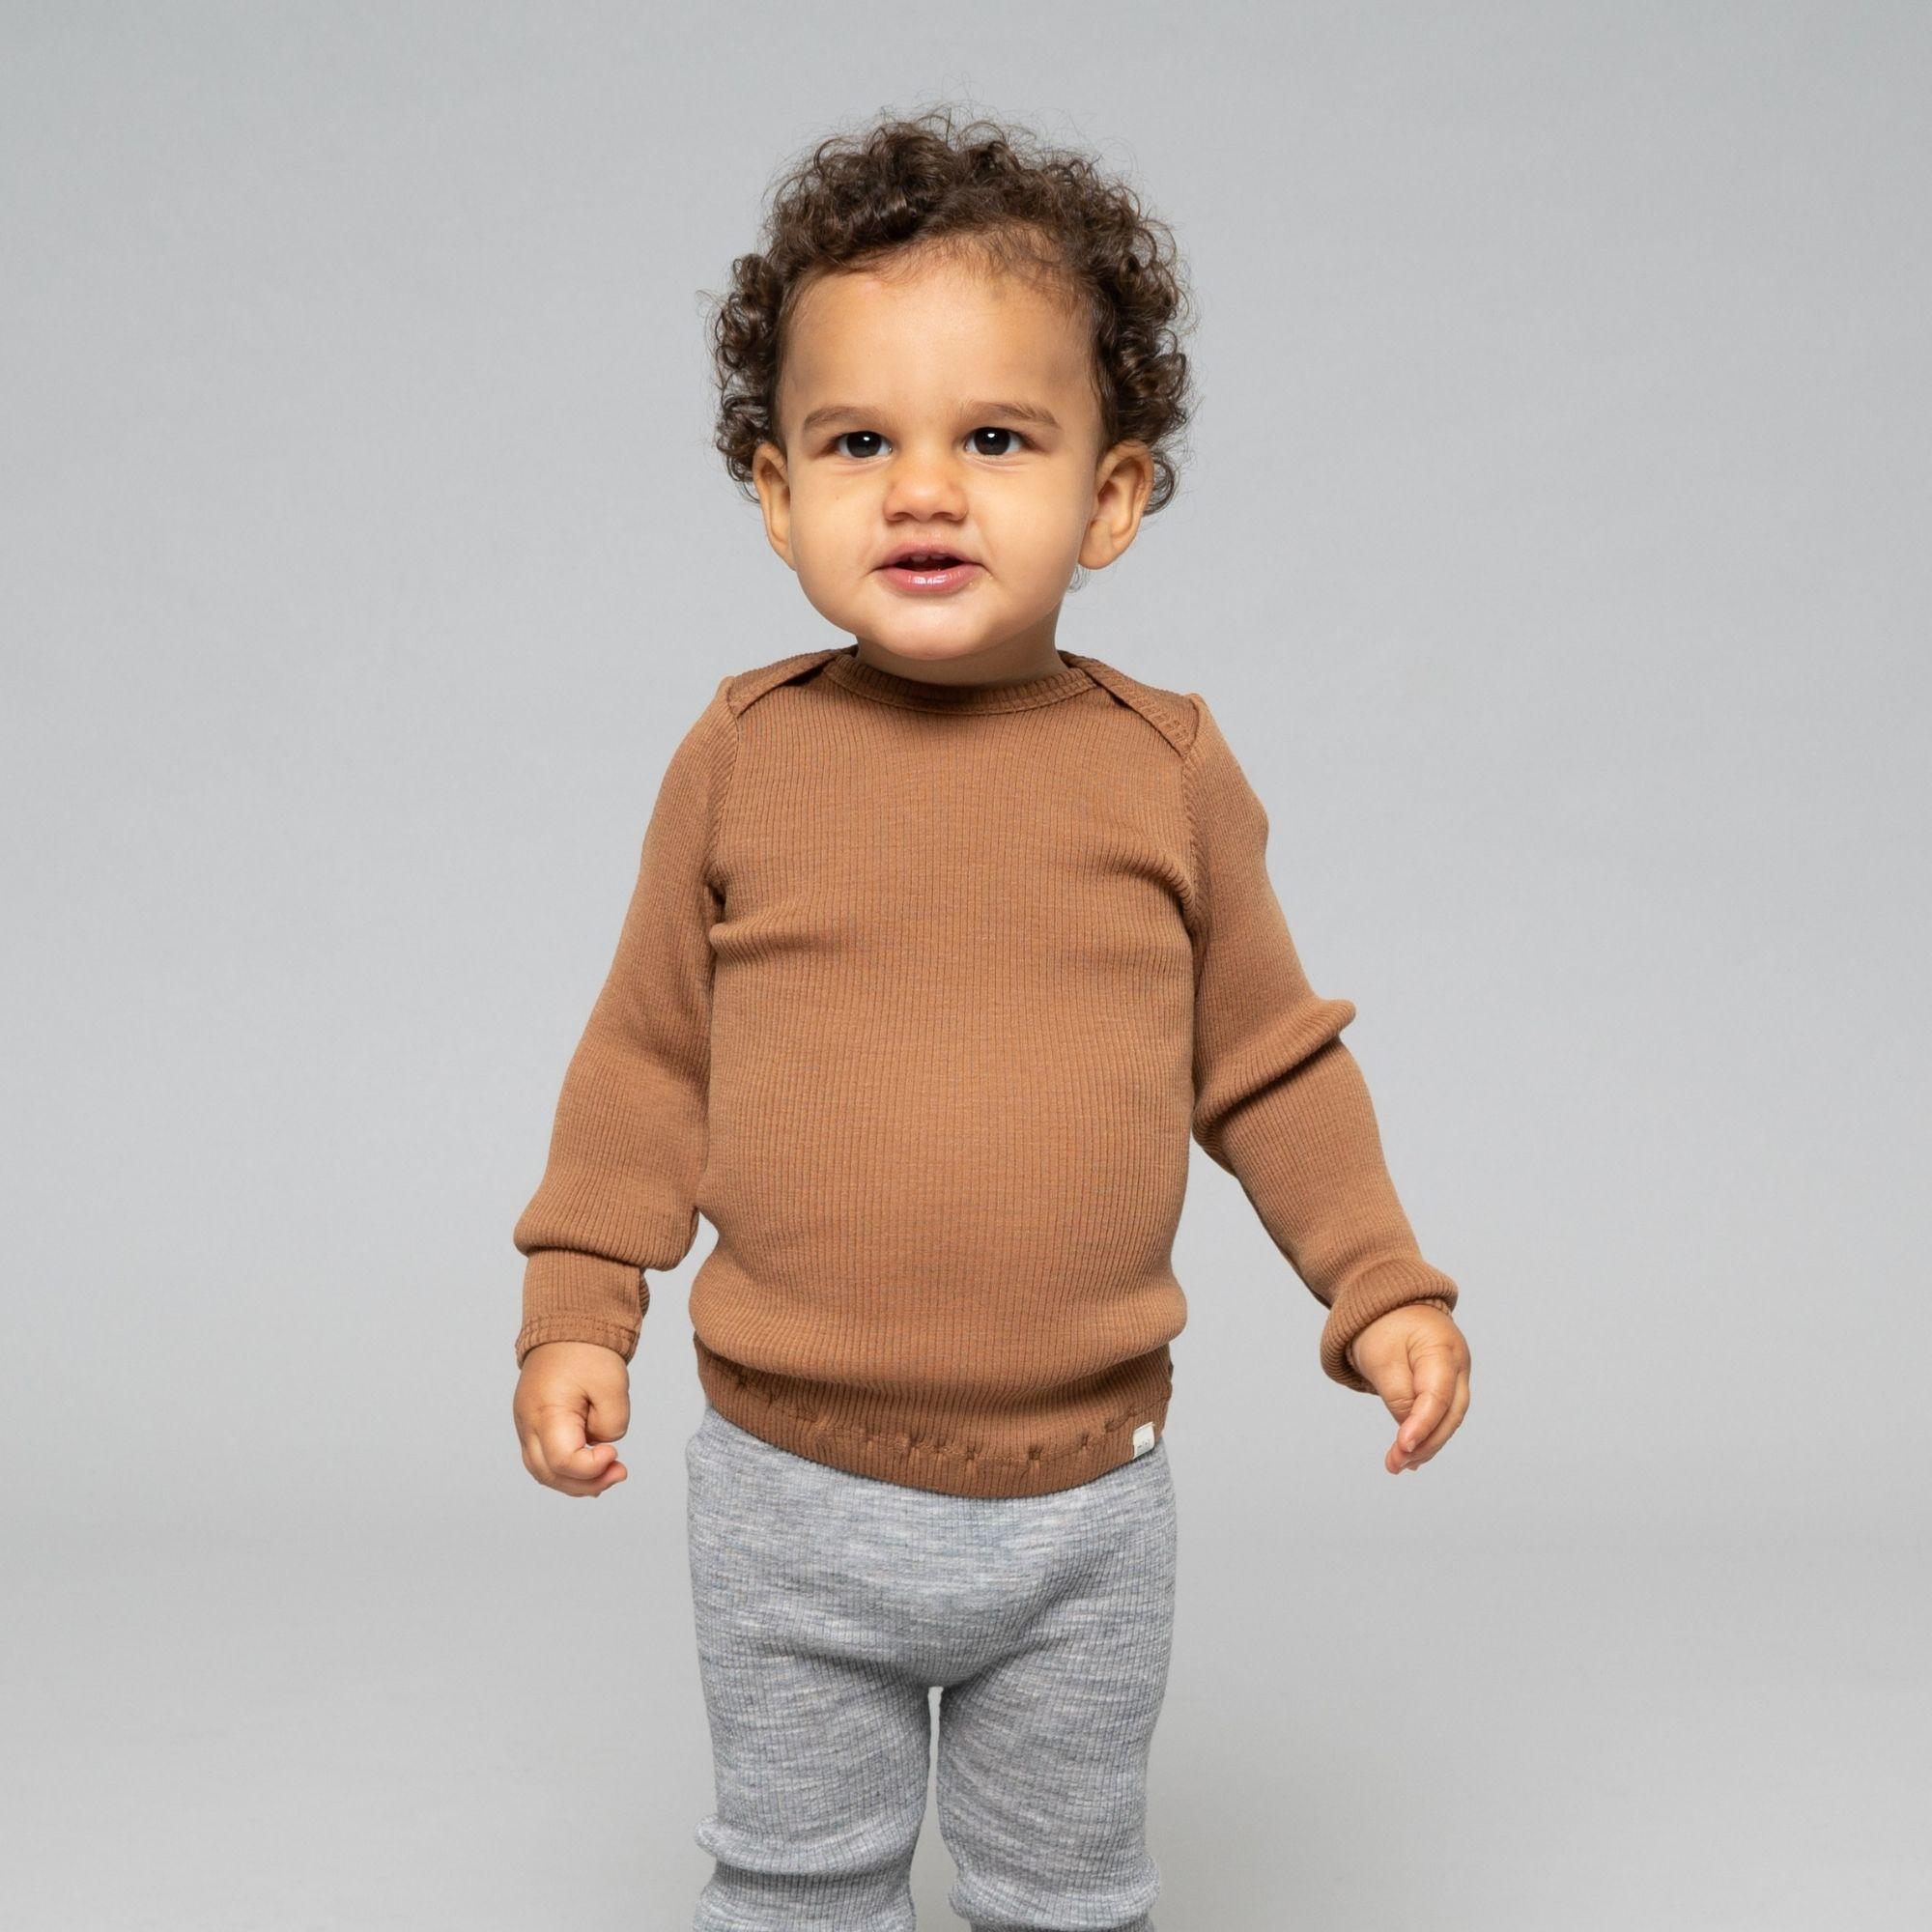 MINIMALISMA - T-shirt bébé - 100 % laine mérinos - Caramel